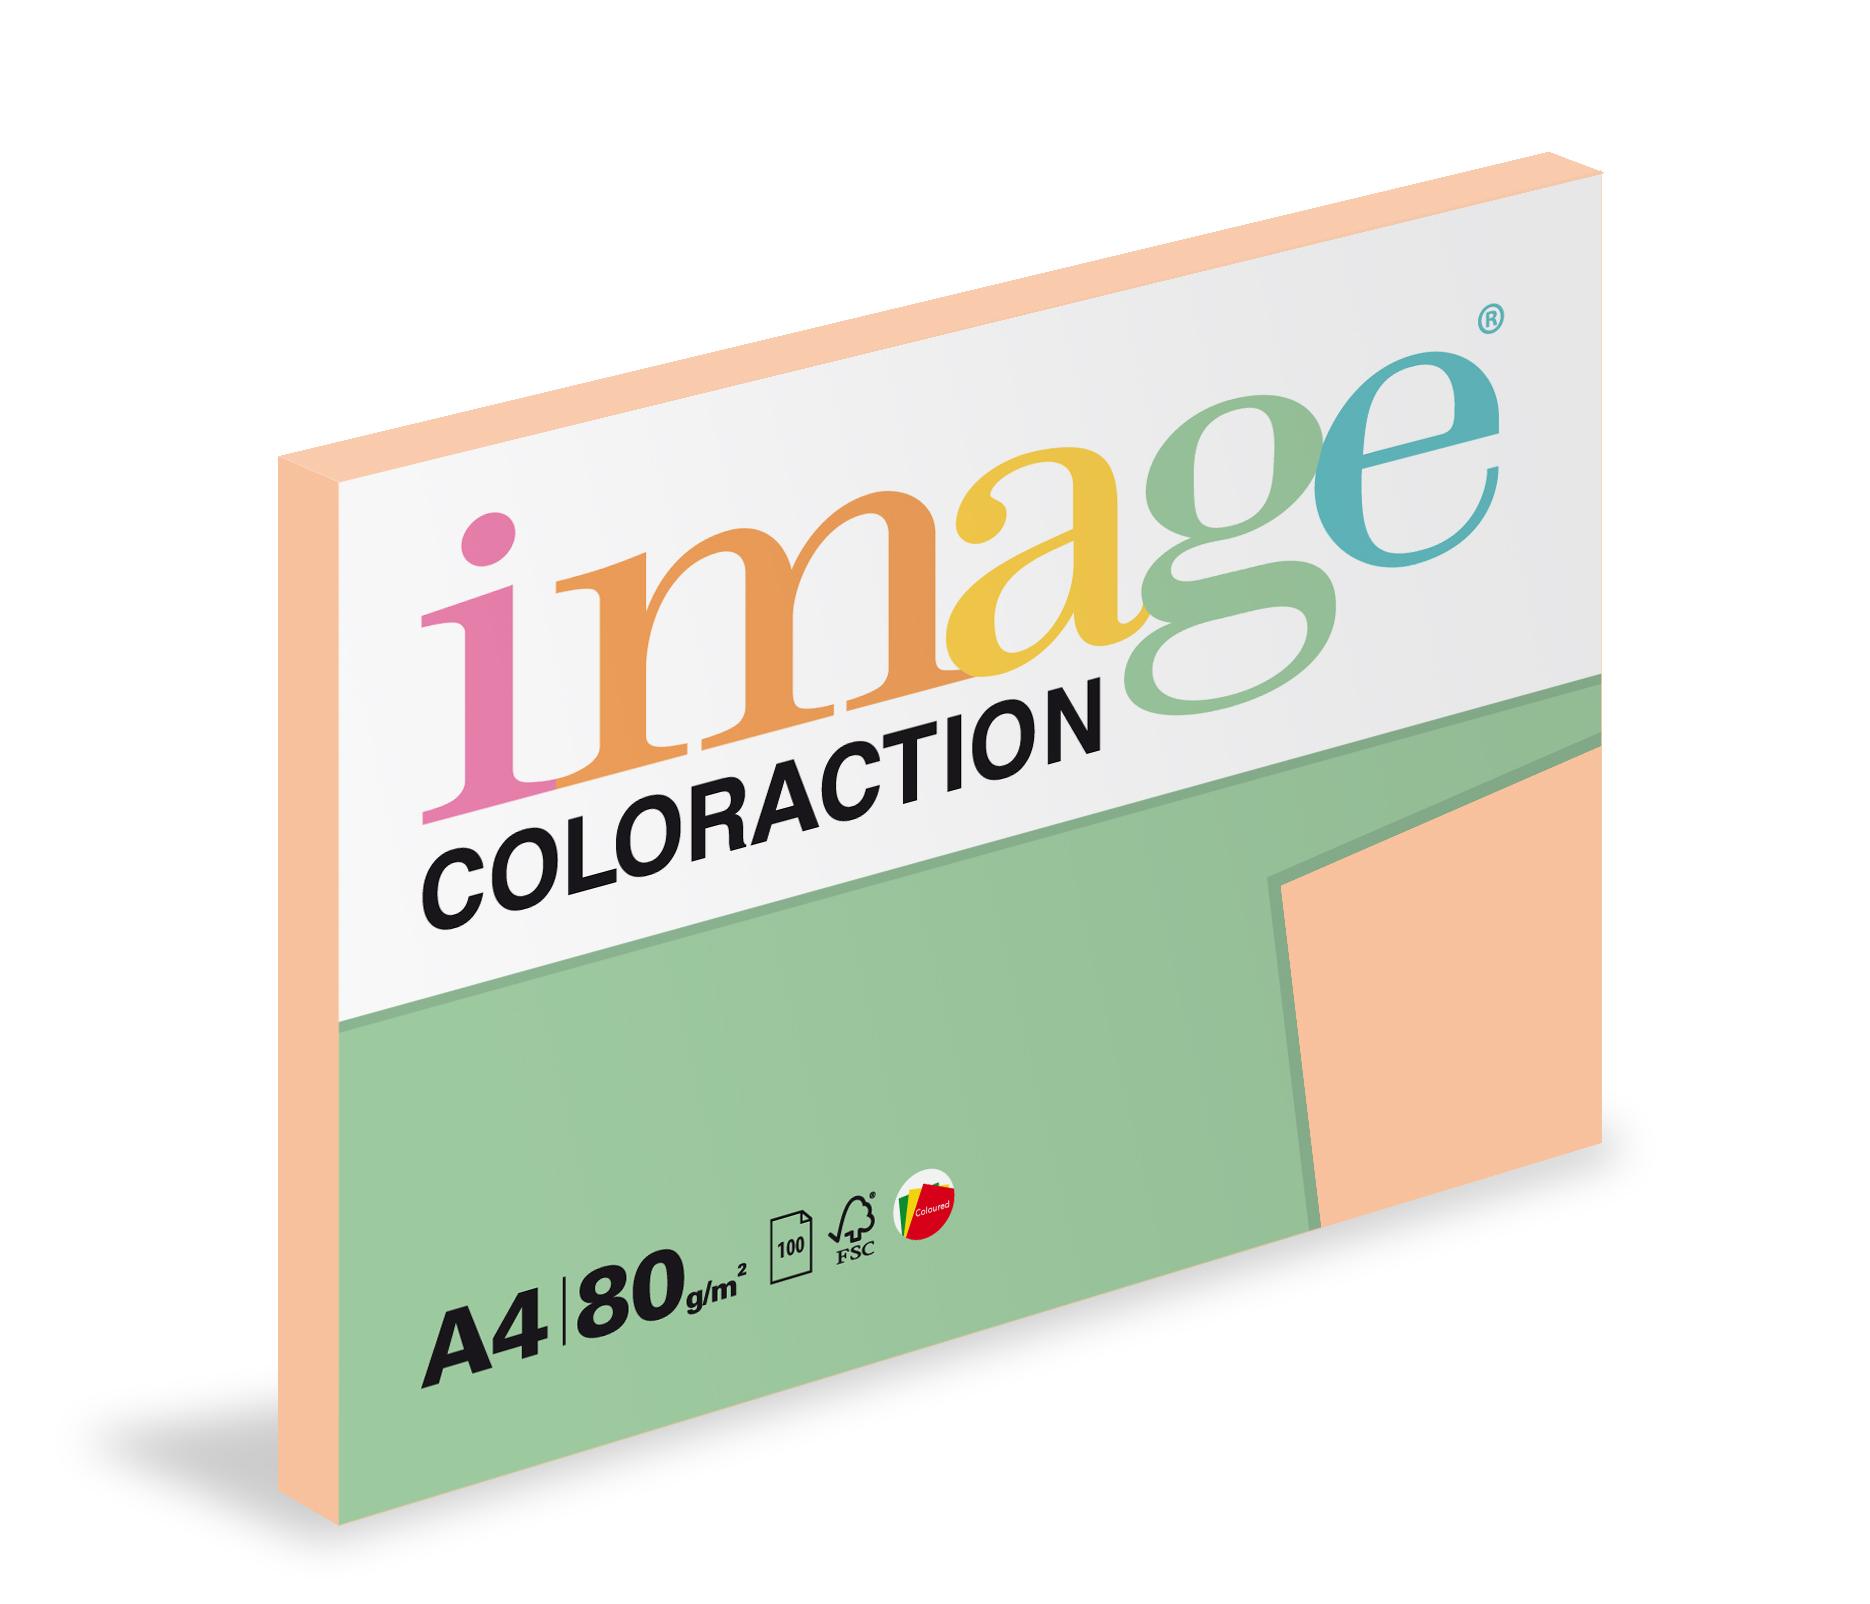 Xerografický papír barevný Coloraction 100 listů - SA24 savana / meruňková / 100 listů